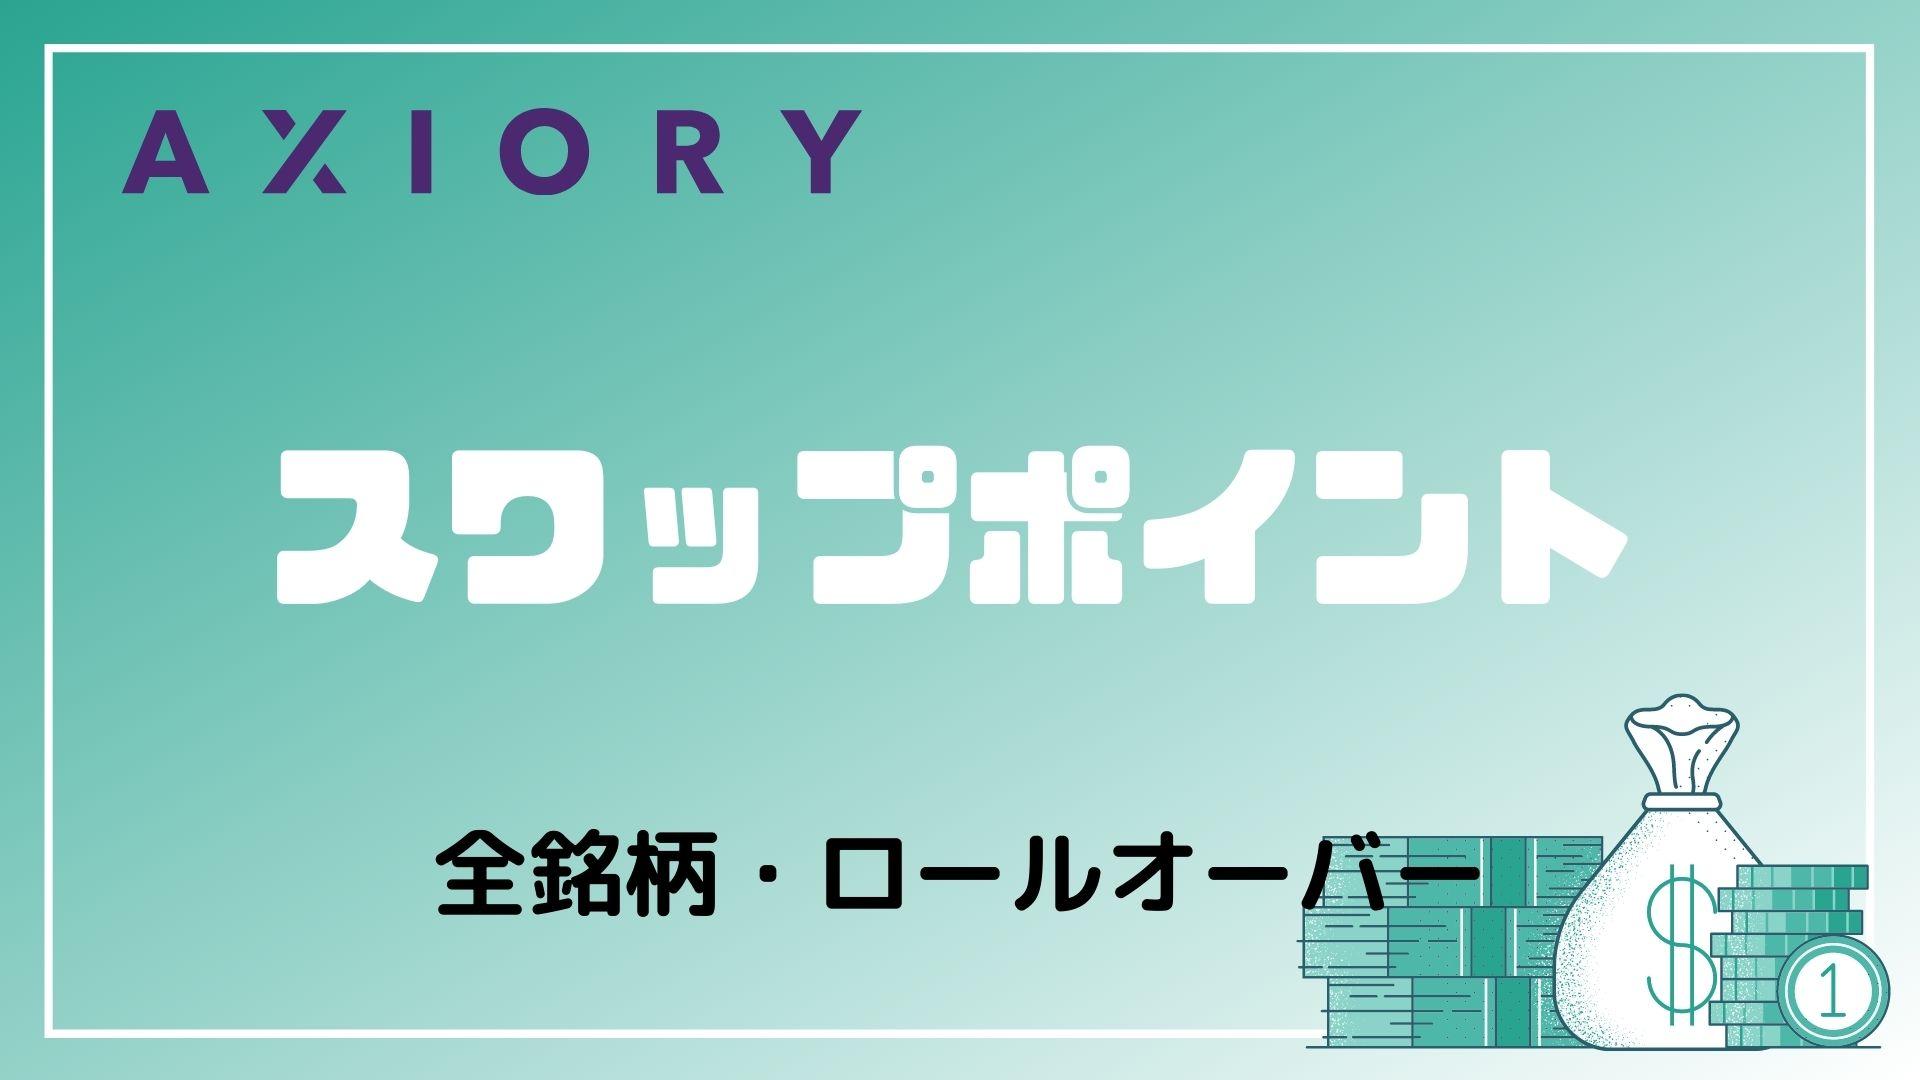 axiory-swap-title